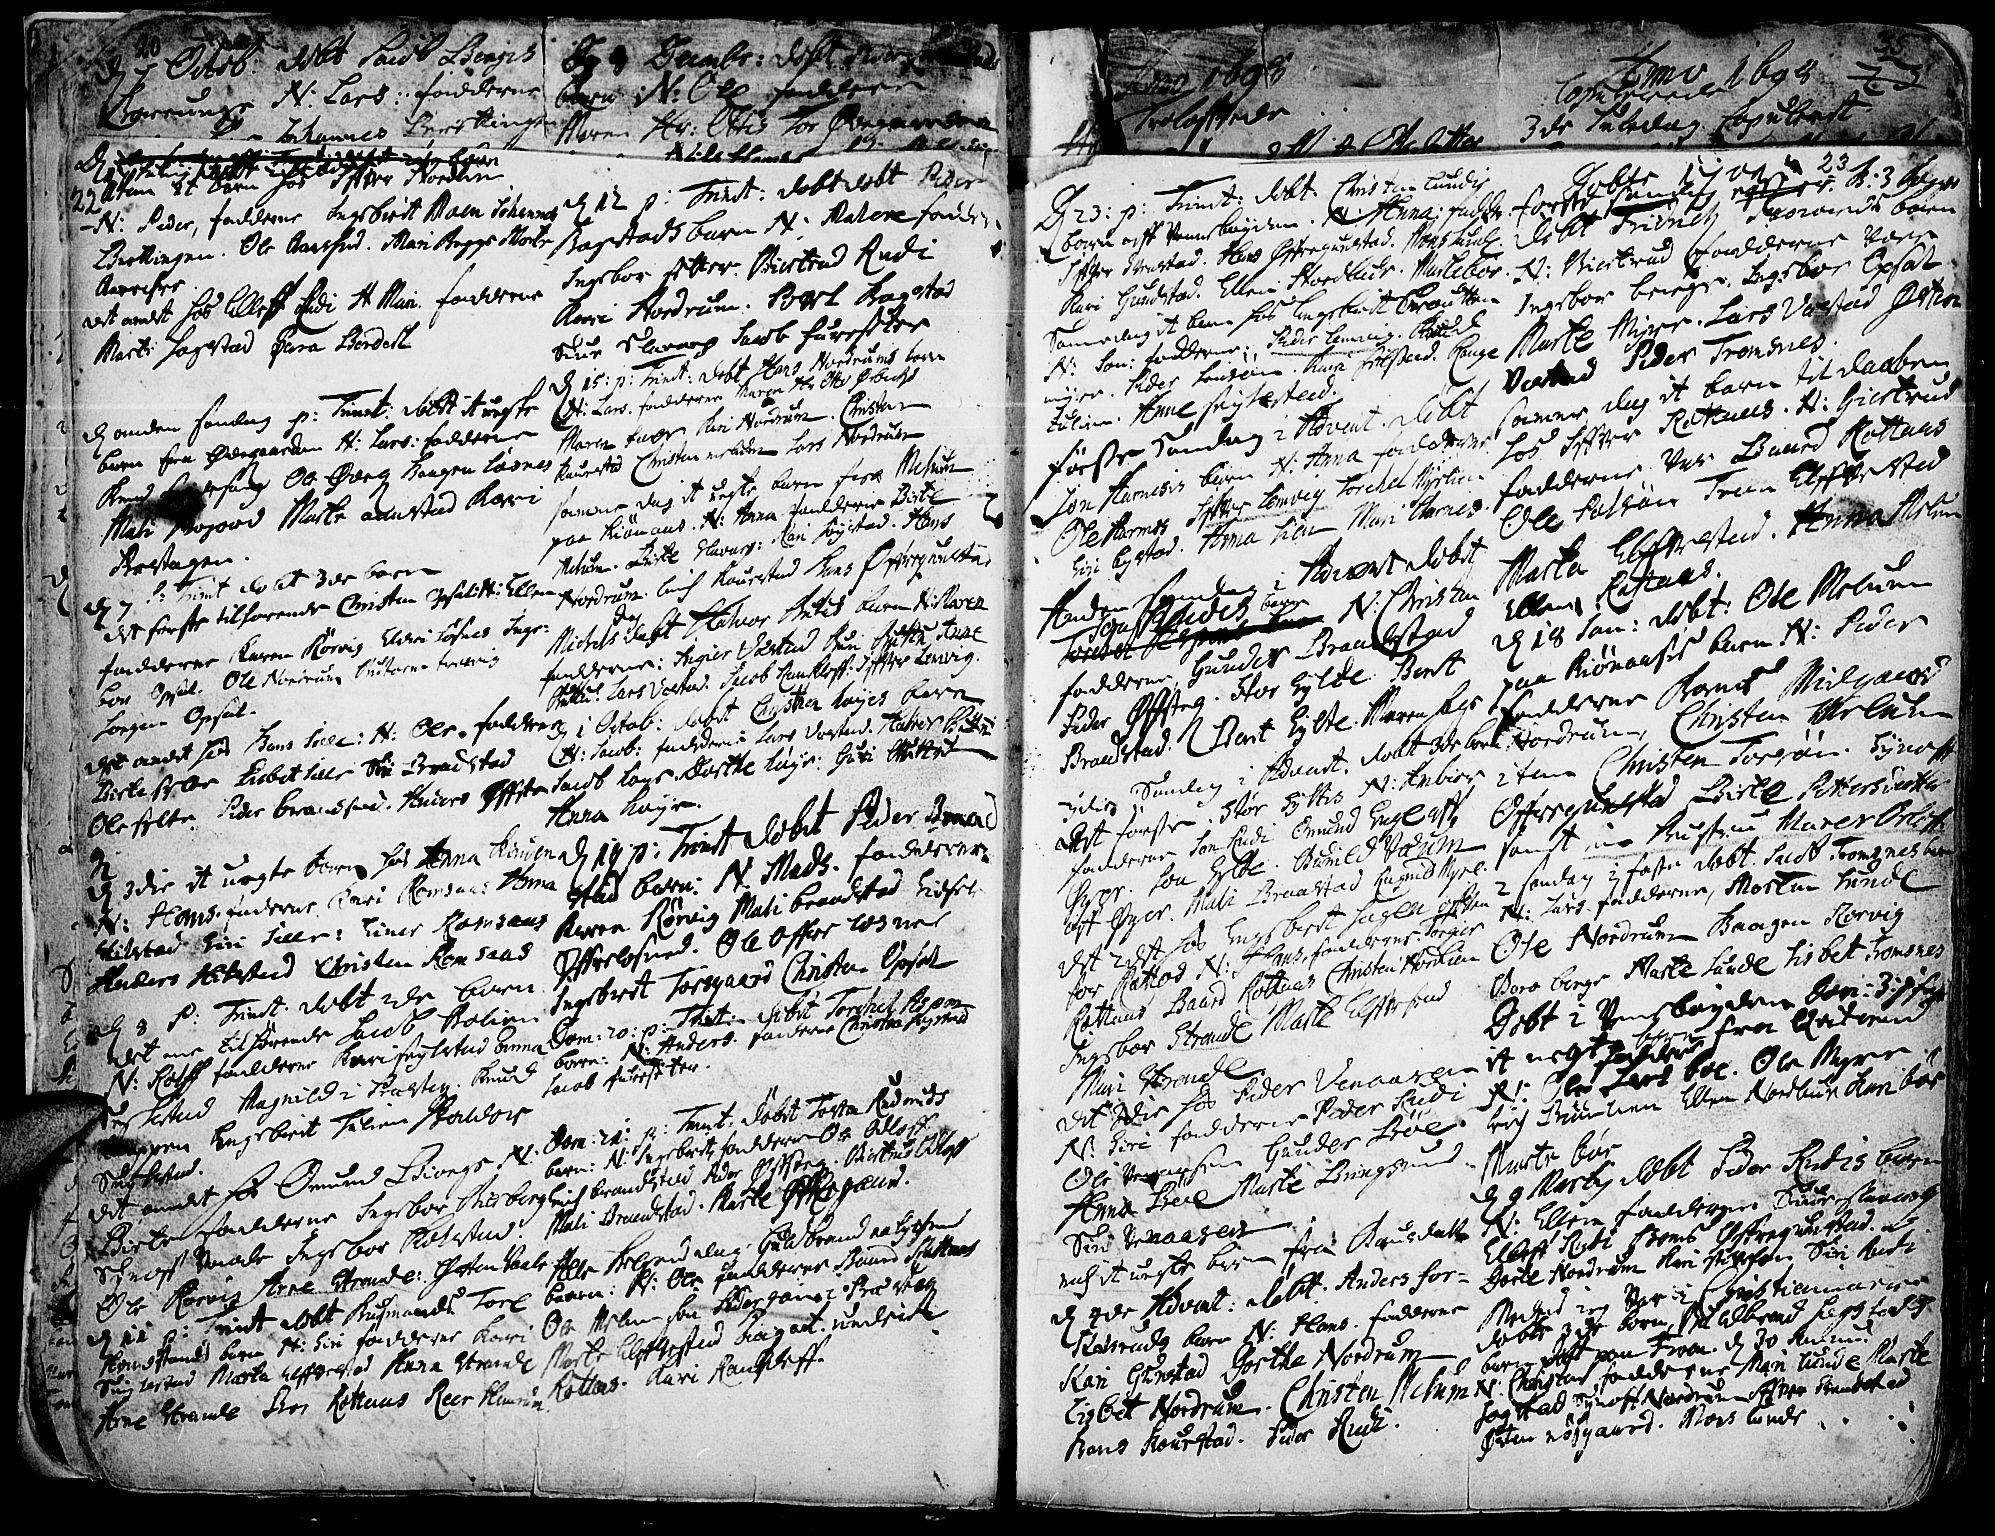 SAH, Ringebu prestekontor, Ministerialbok nr. 1, 1696-1733, s. 22-23